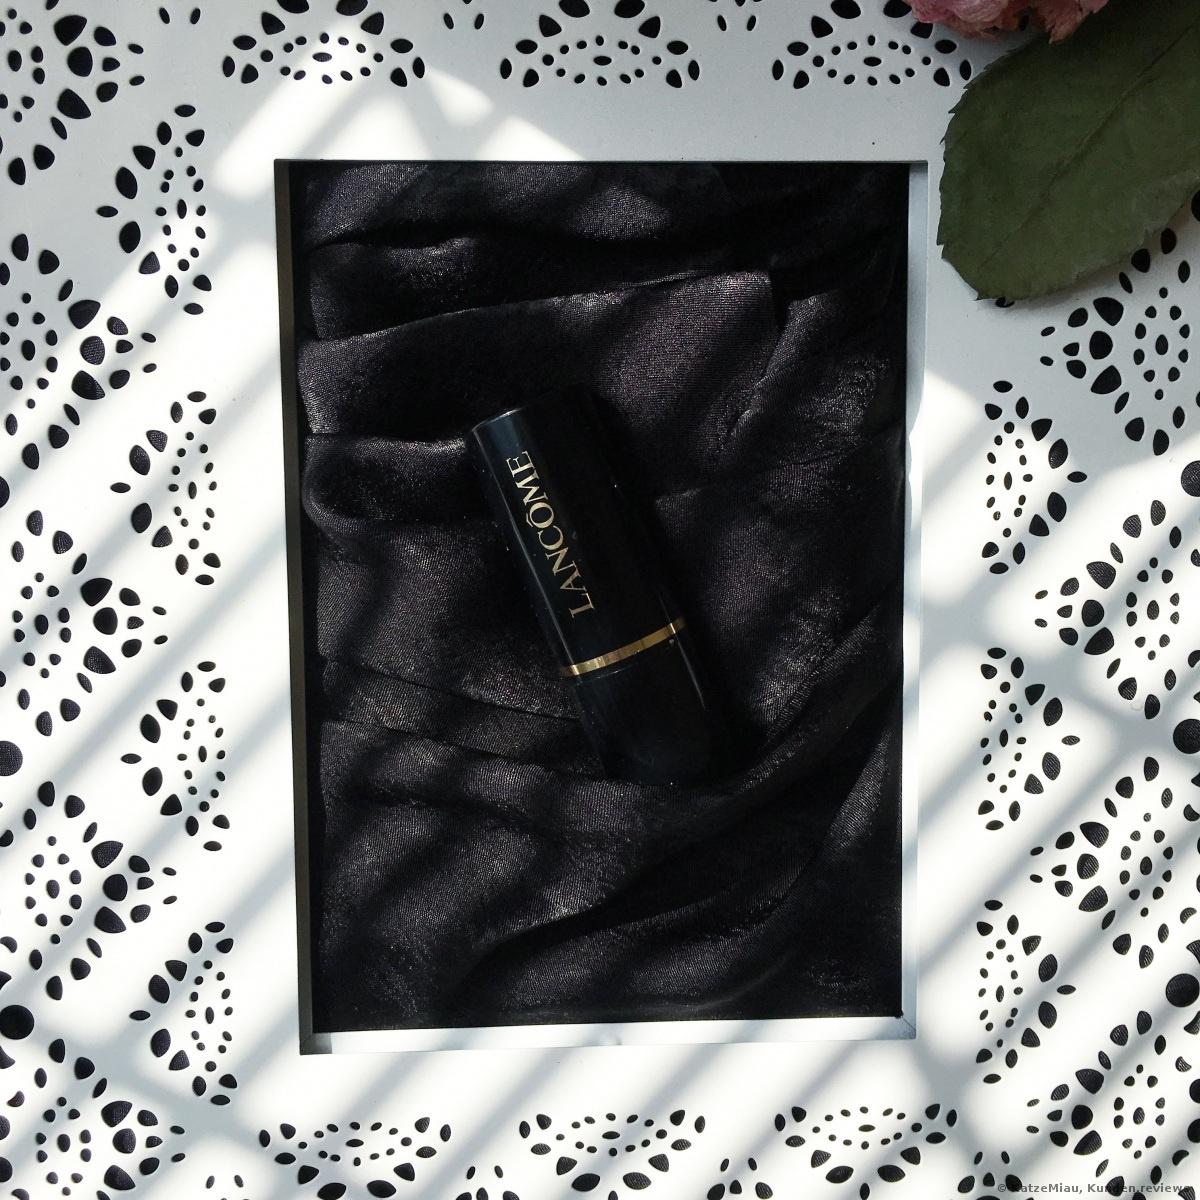 Lancôme Gesichts-Make-up Teint Idole Ultra Wear Foundation Stick